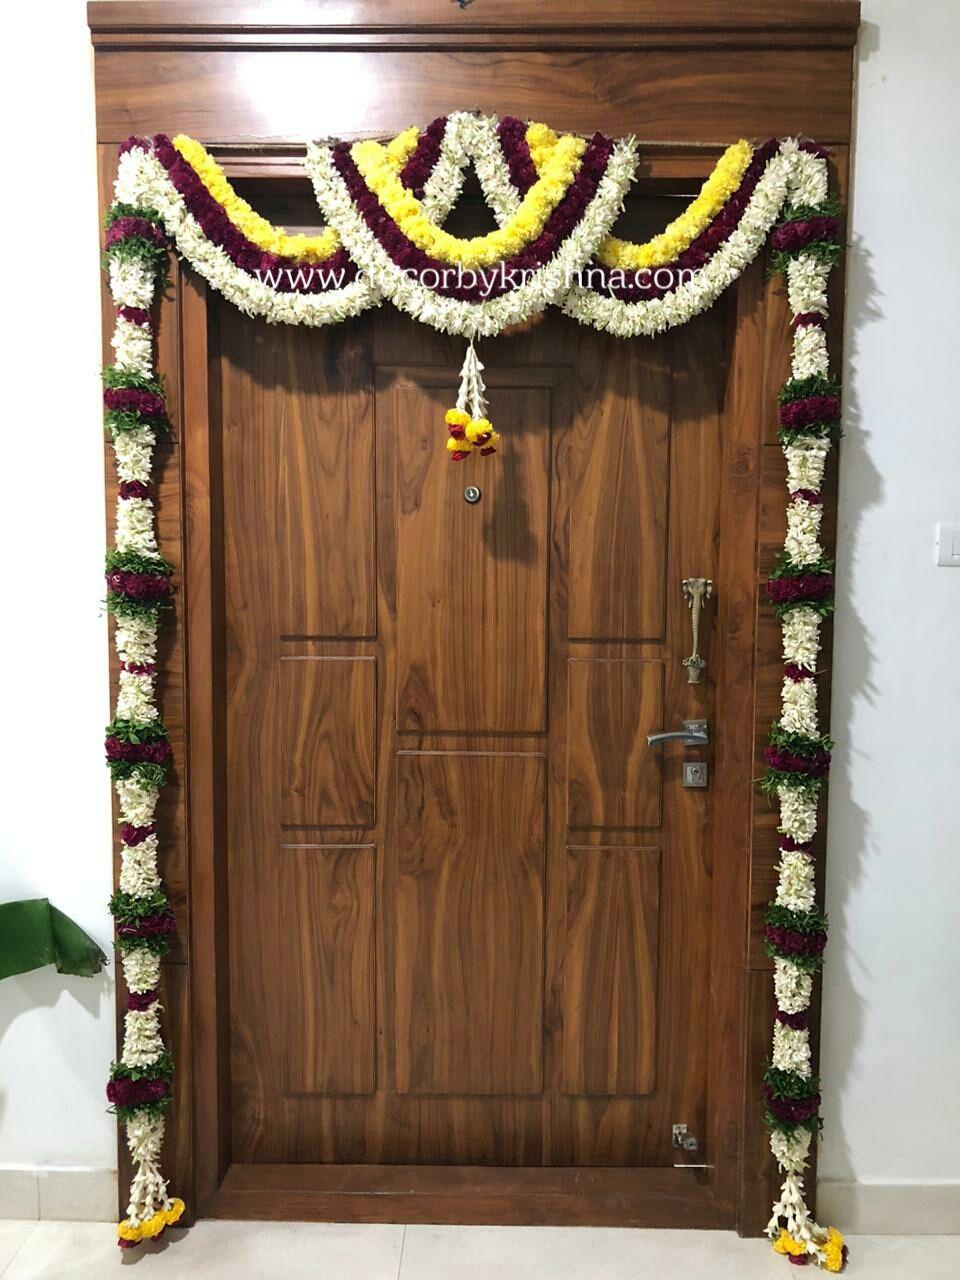 Main Door Decor Hanging Floral Decor Pooja Room Door Design Indian Floral Decor